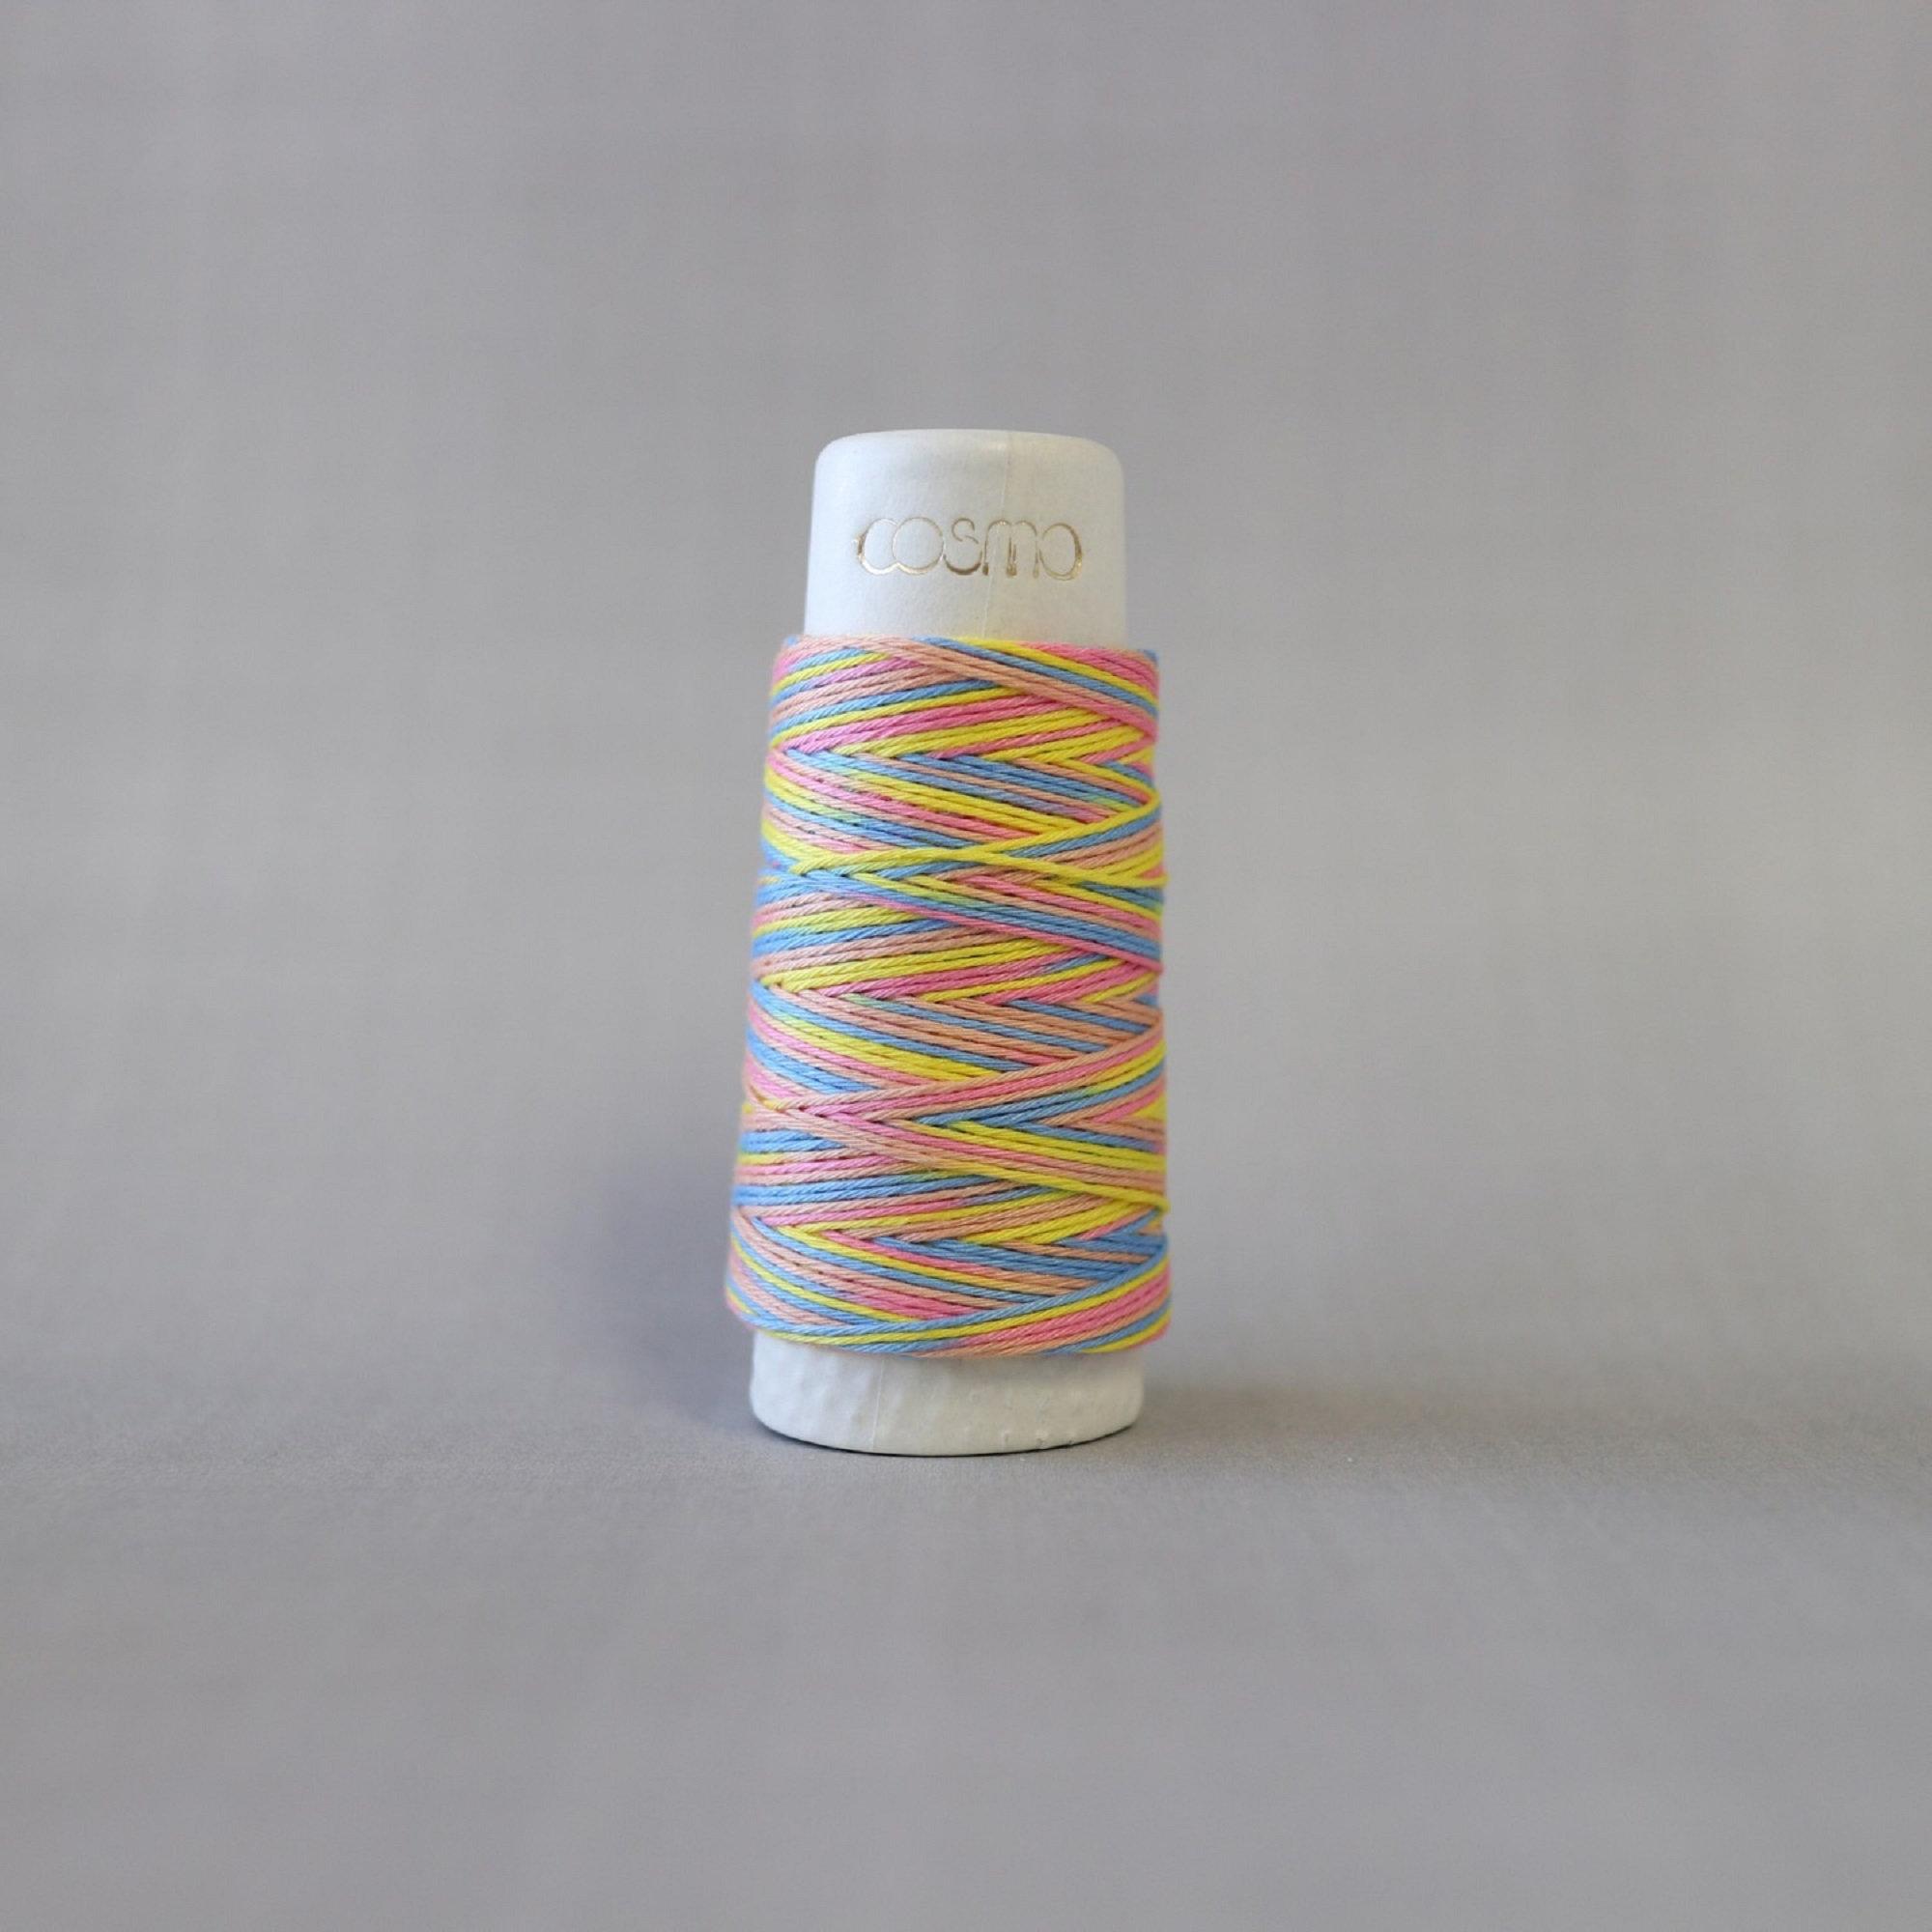 Lecien COSMO hidamari & Sashiko Variegated Cotton Thread - 30m - No. 89-303 Rainbow Sorbet